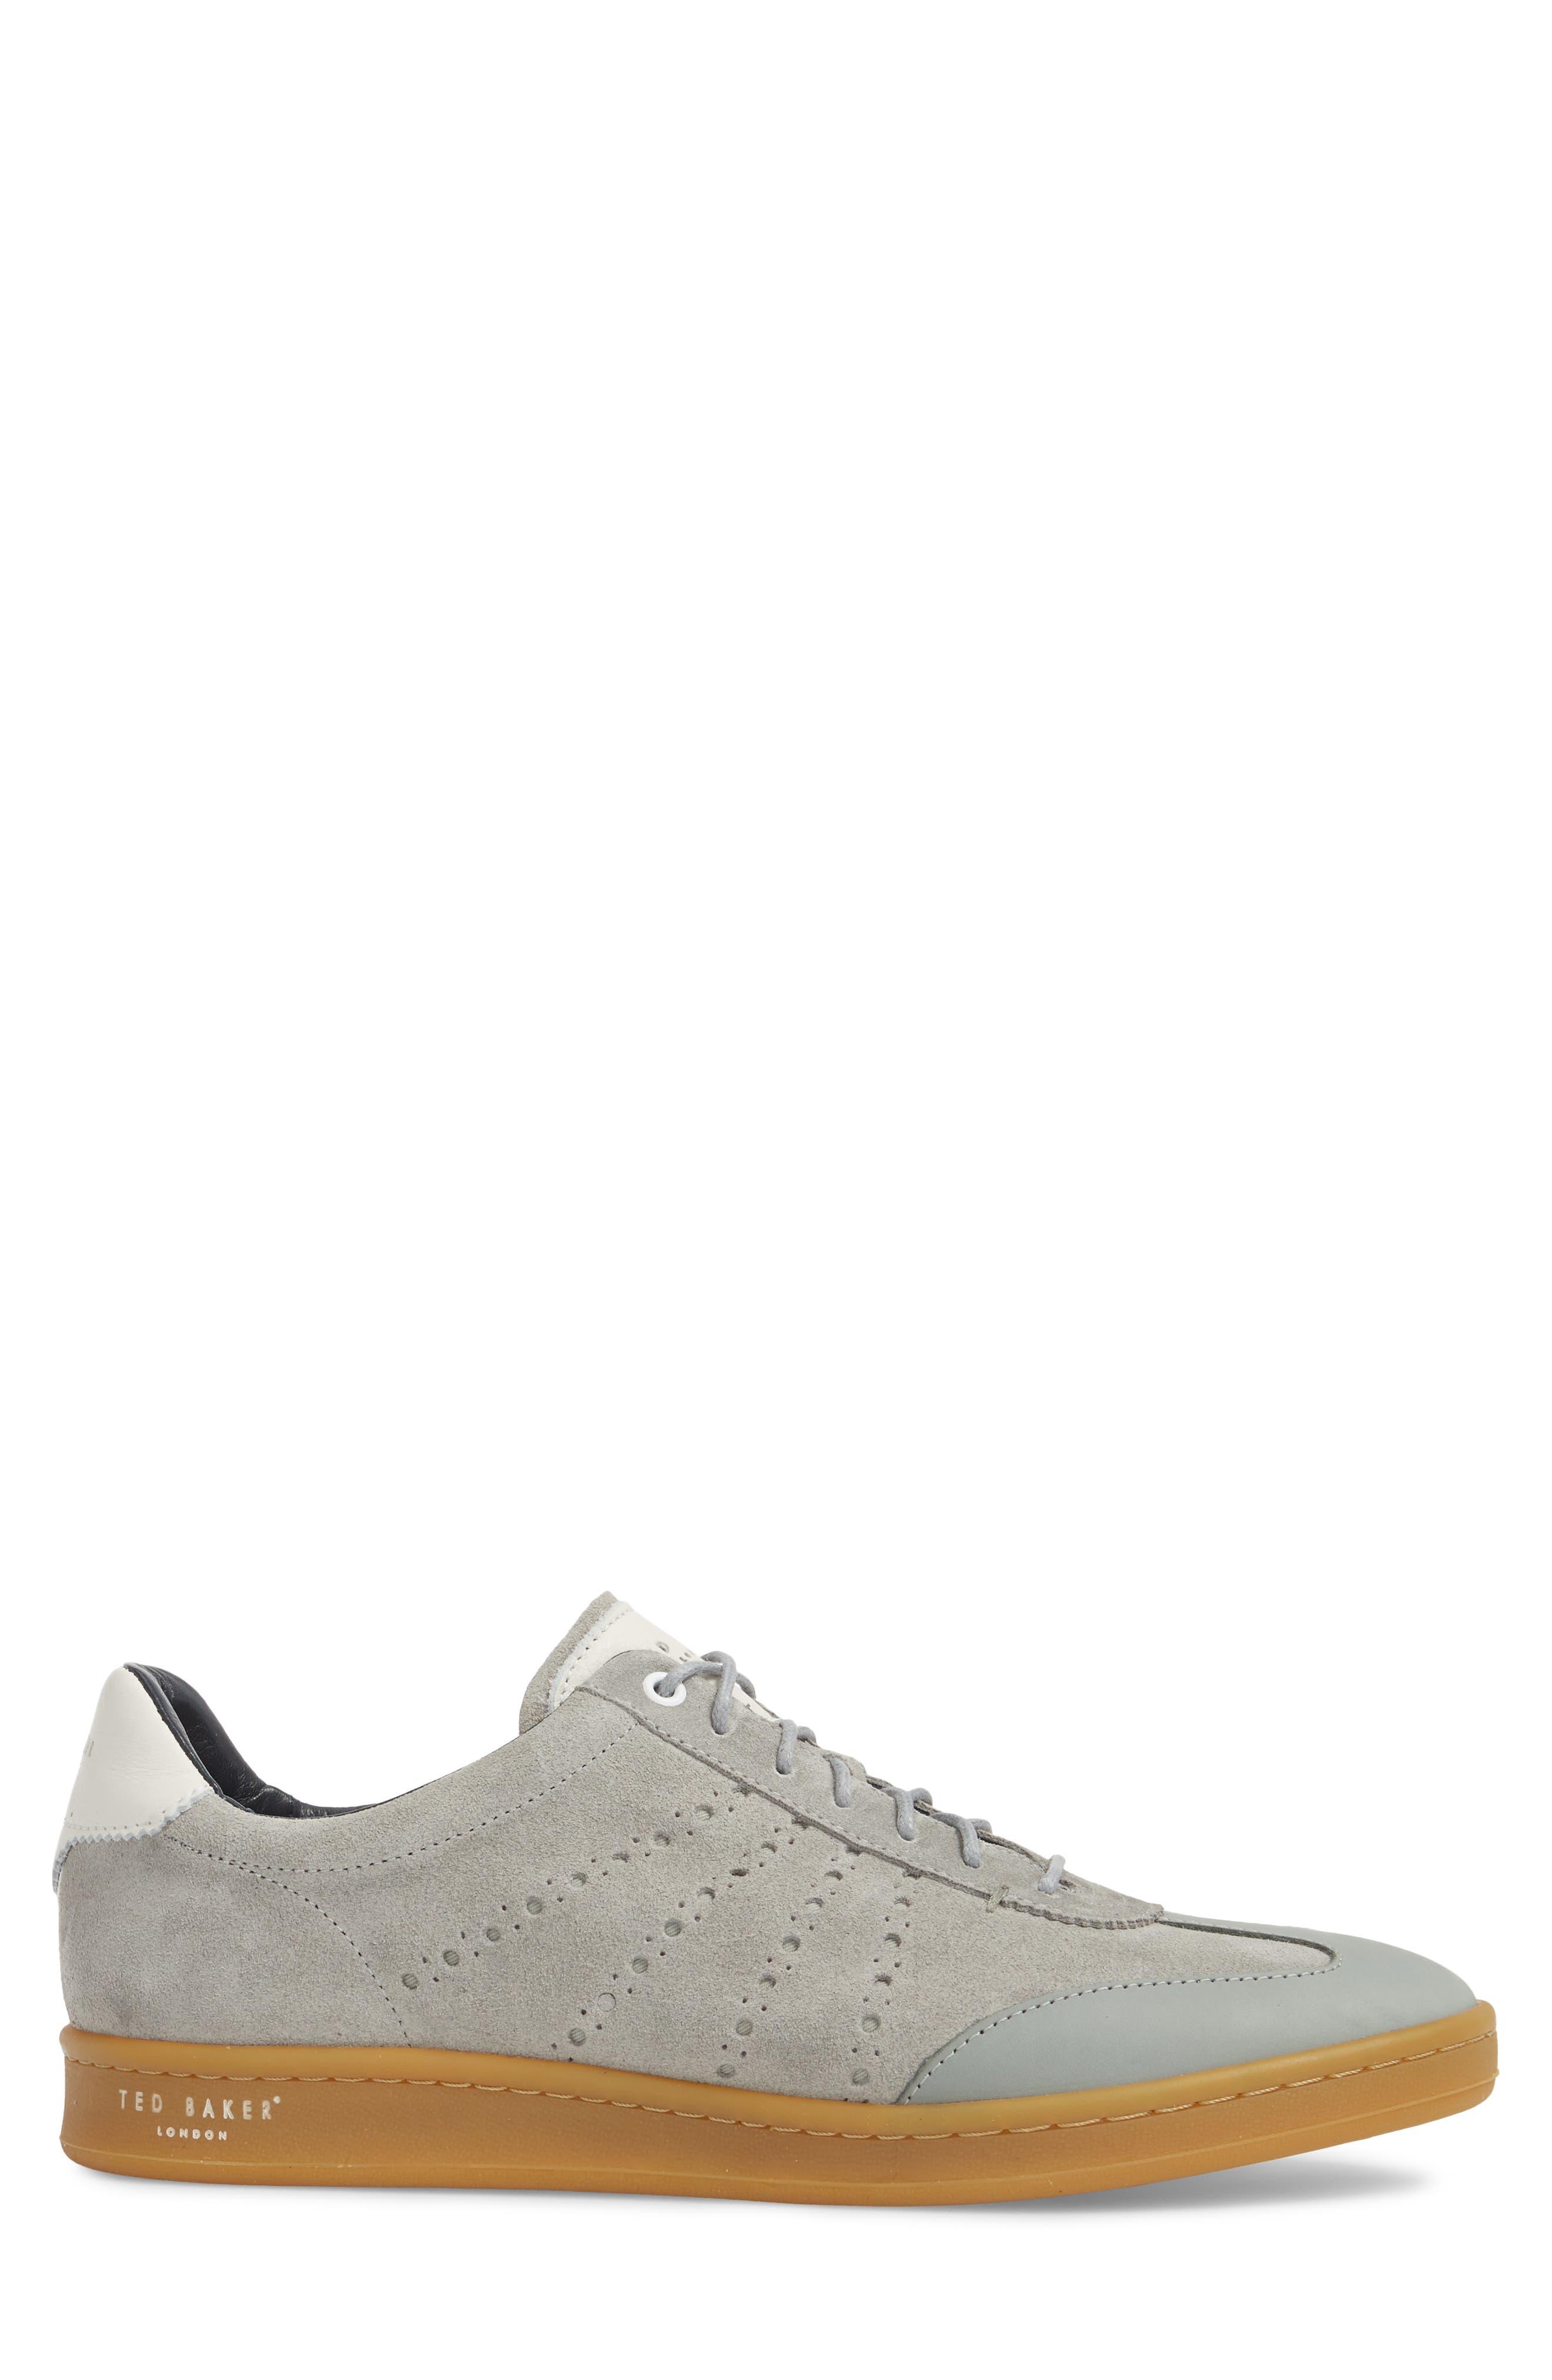 Orlees Low Top Sneaker,                             Alternate thumbnail 3, color,                             052